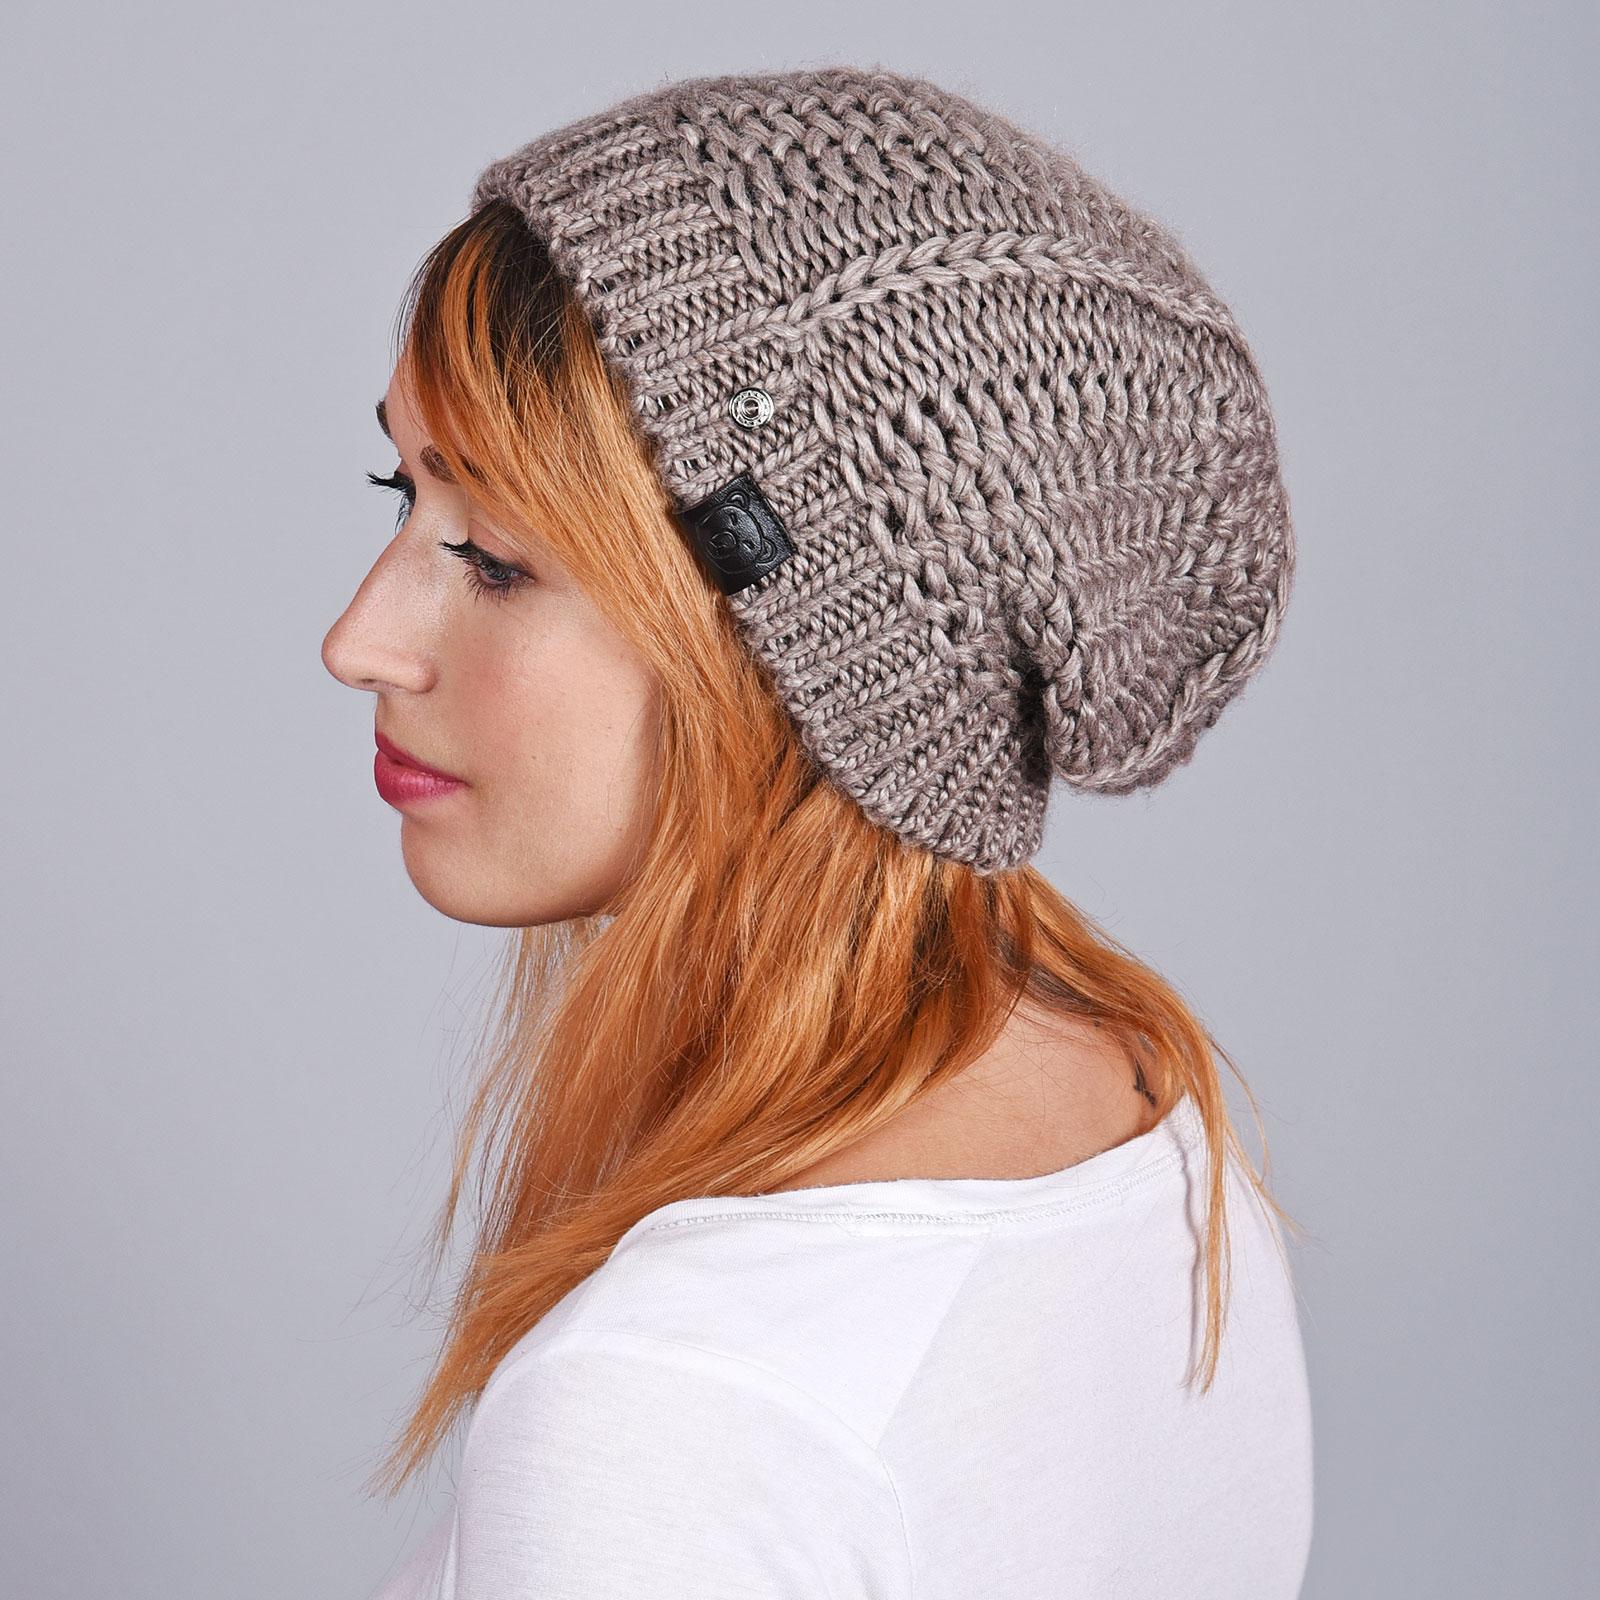 CP-01072-VF16-1-bonnet-femme-taupe